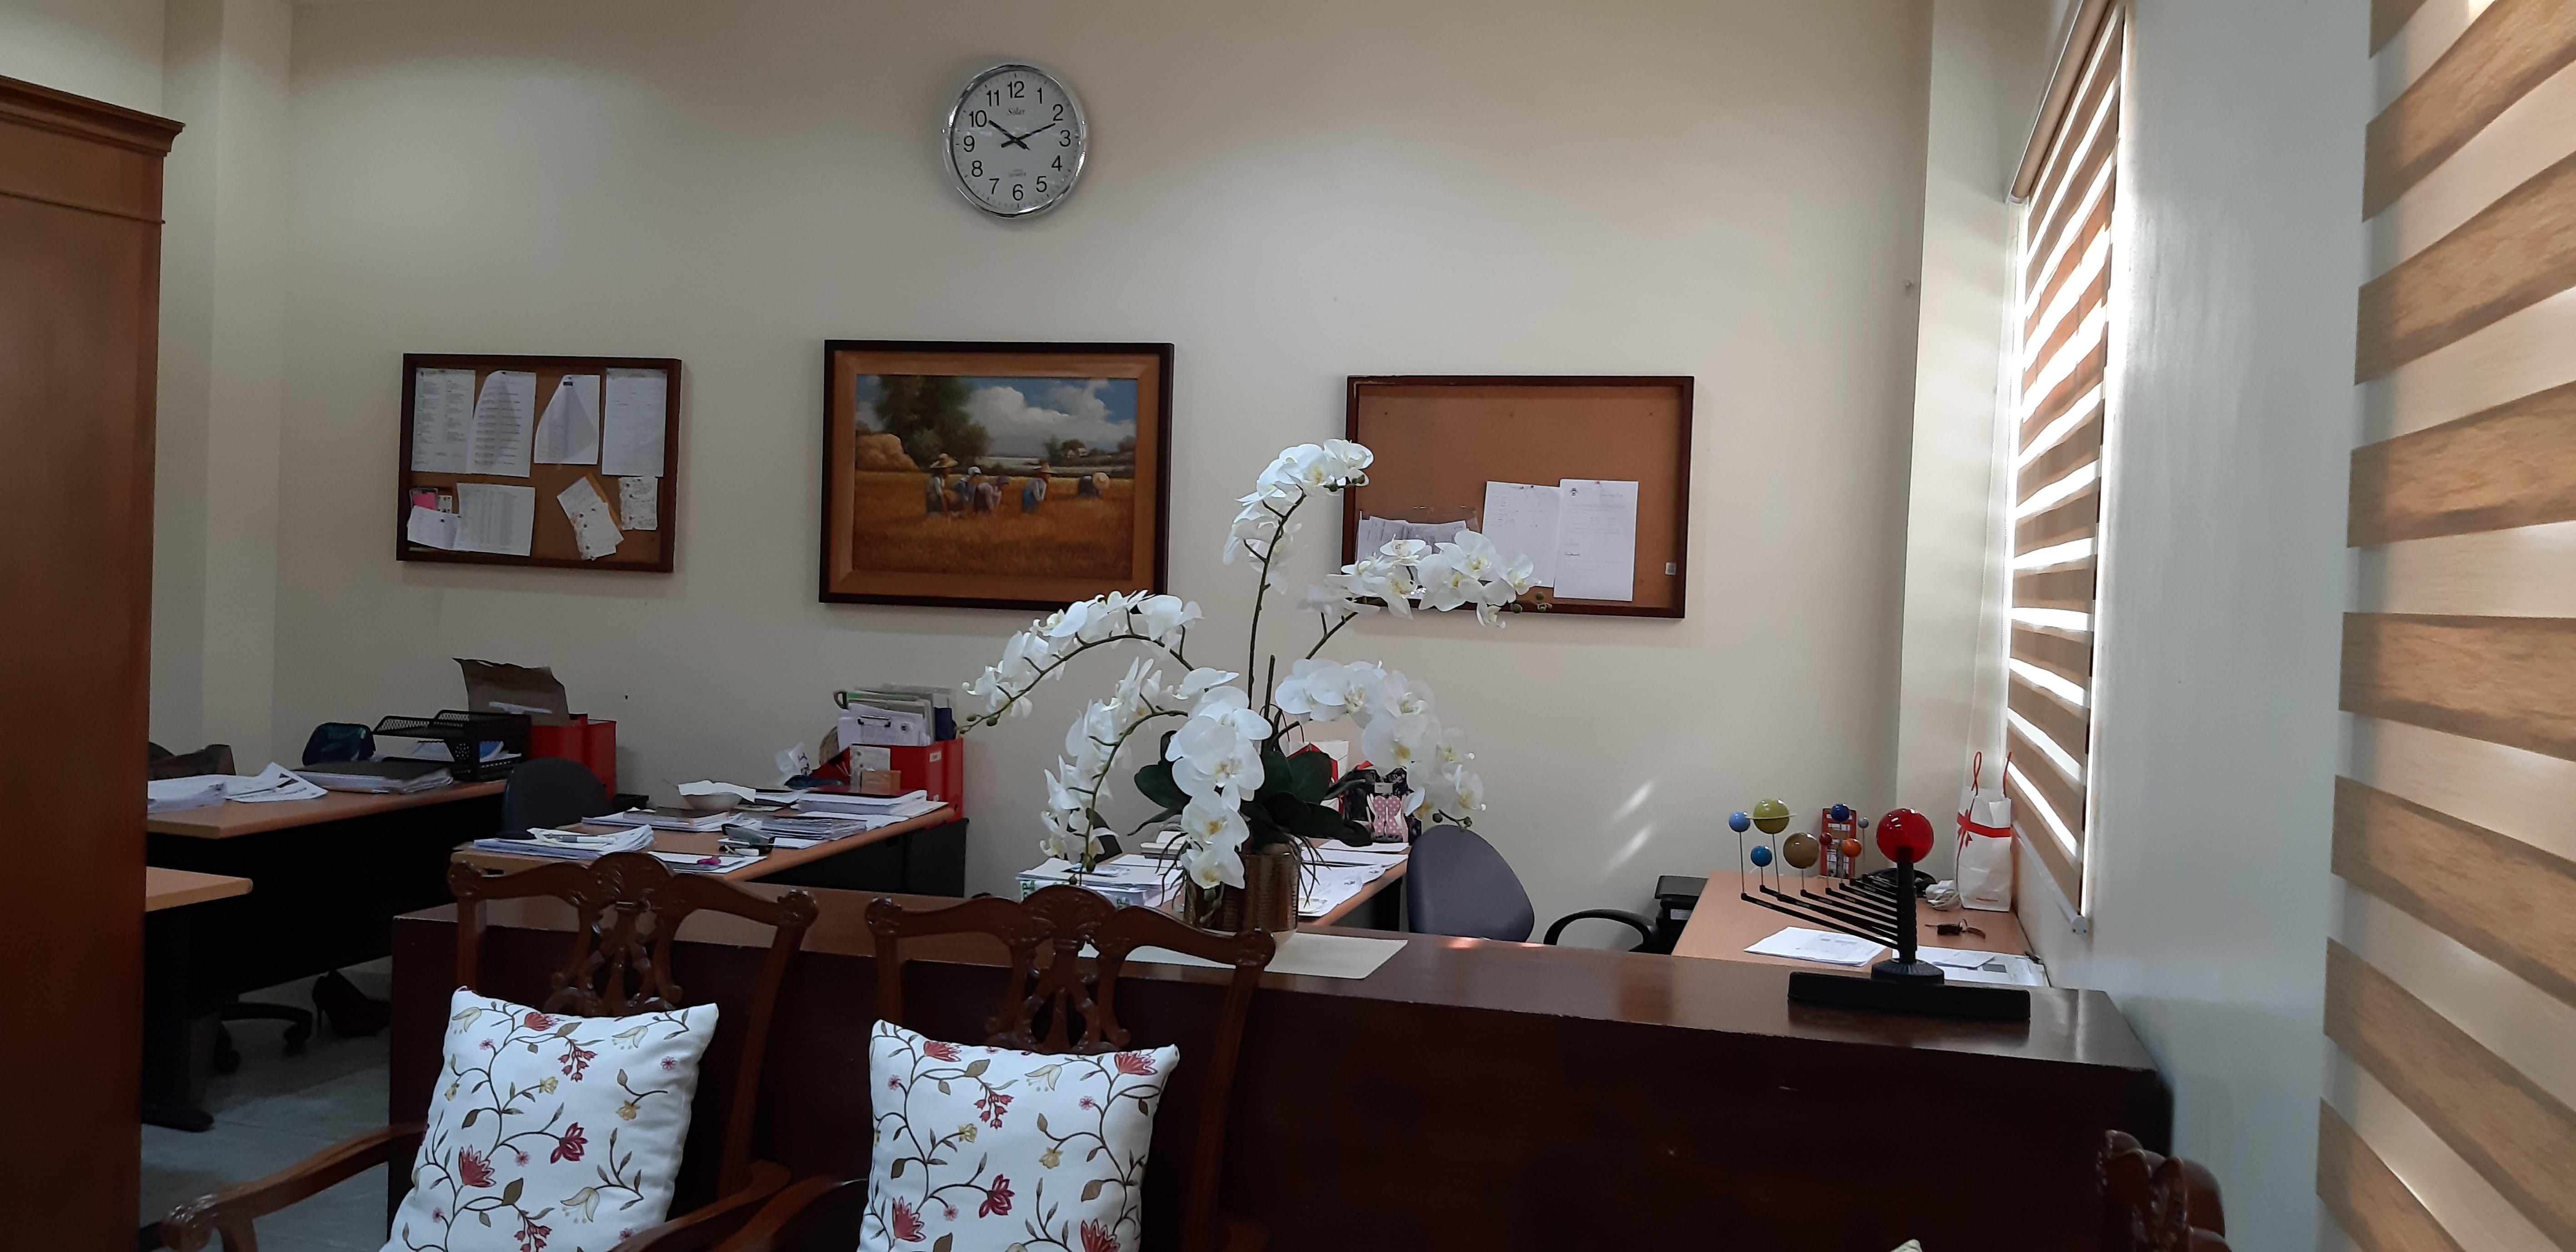 Guidance Council Office Header Photo